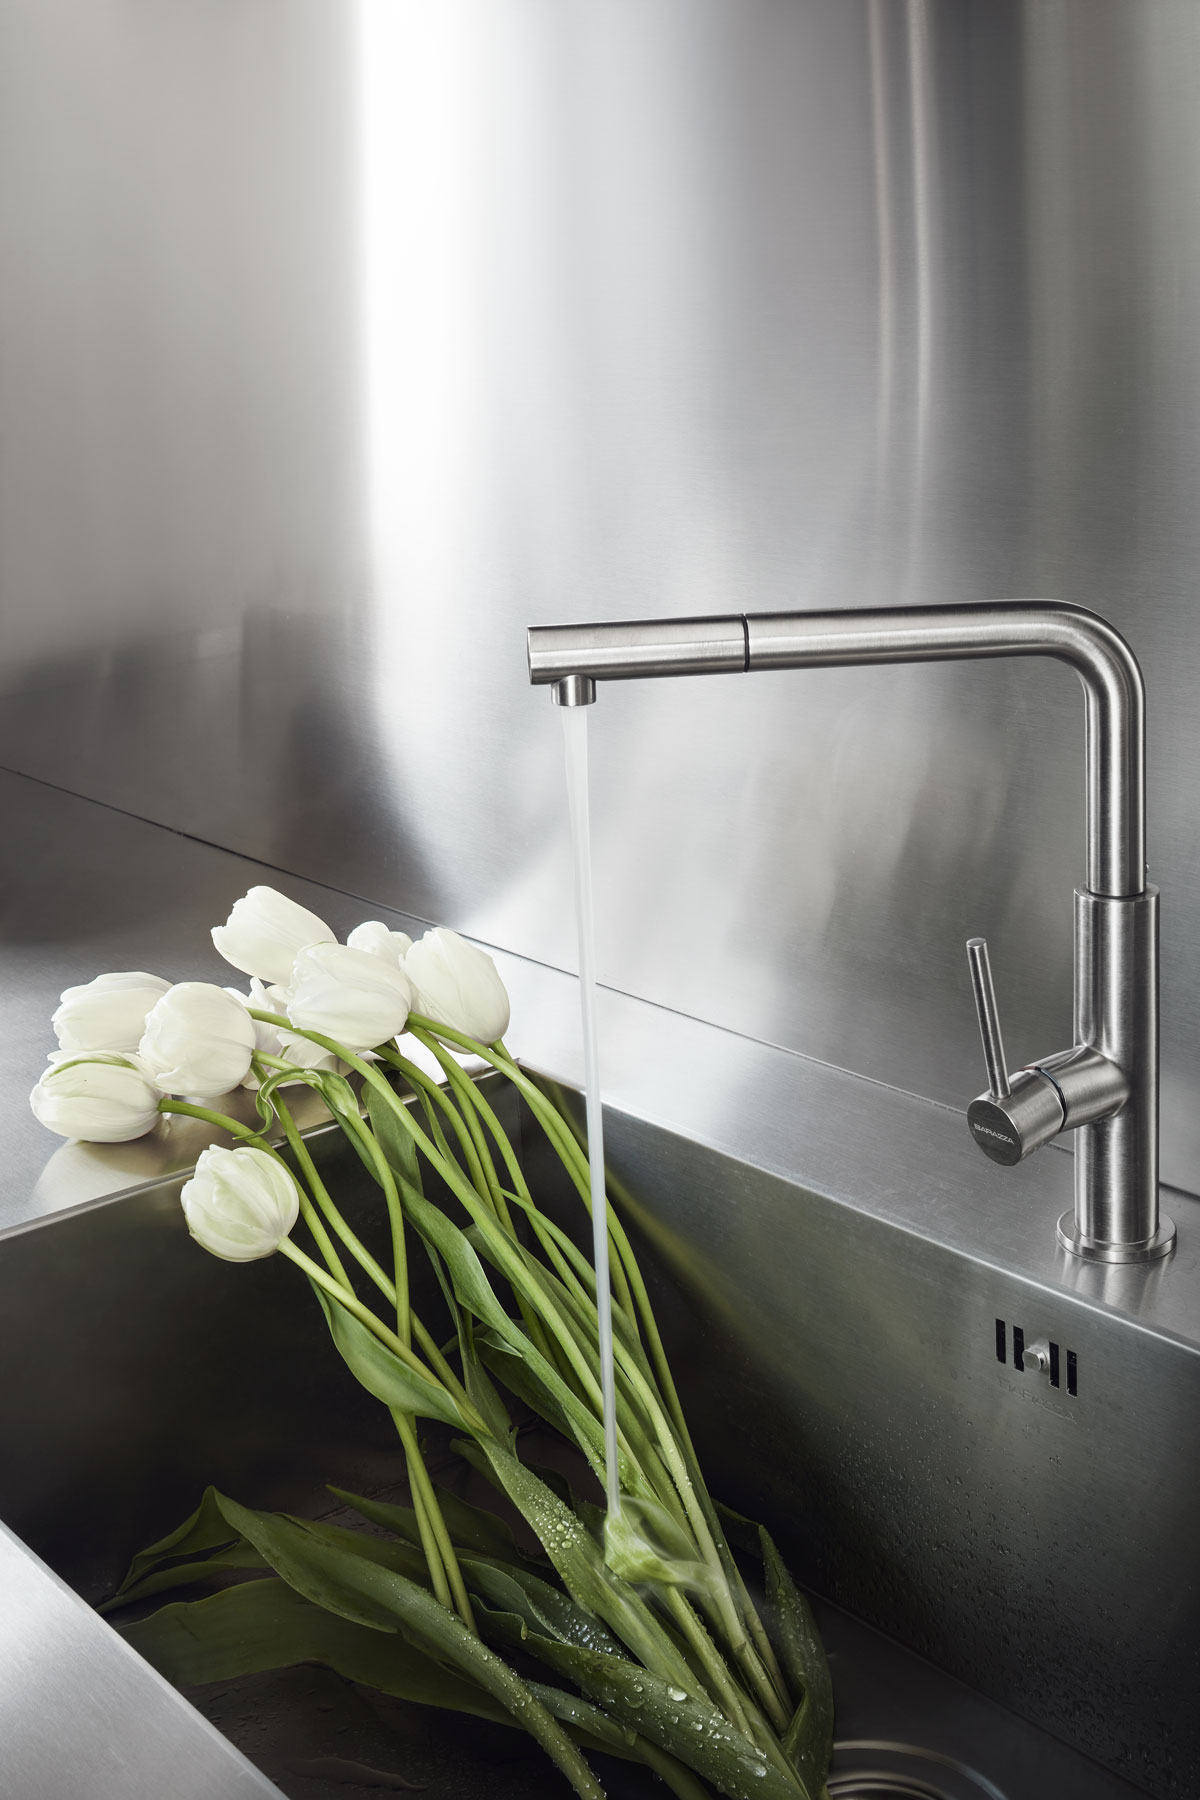 white tulips in a modern stainless steel kitchen sink